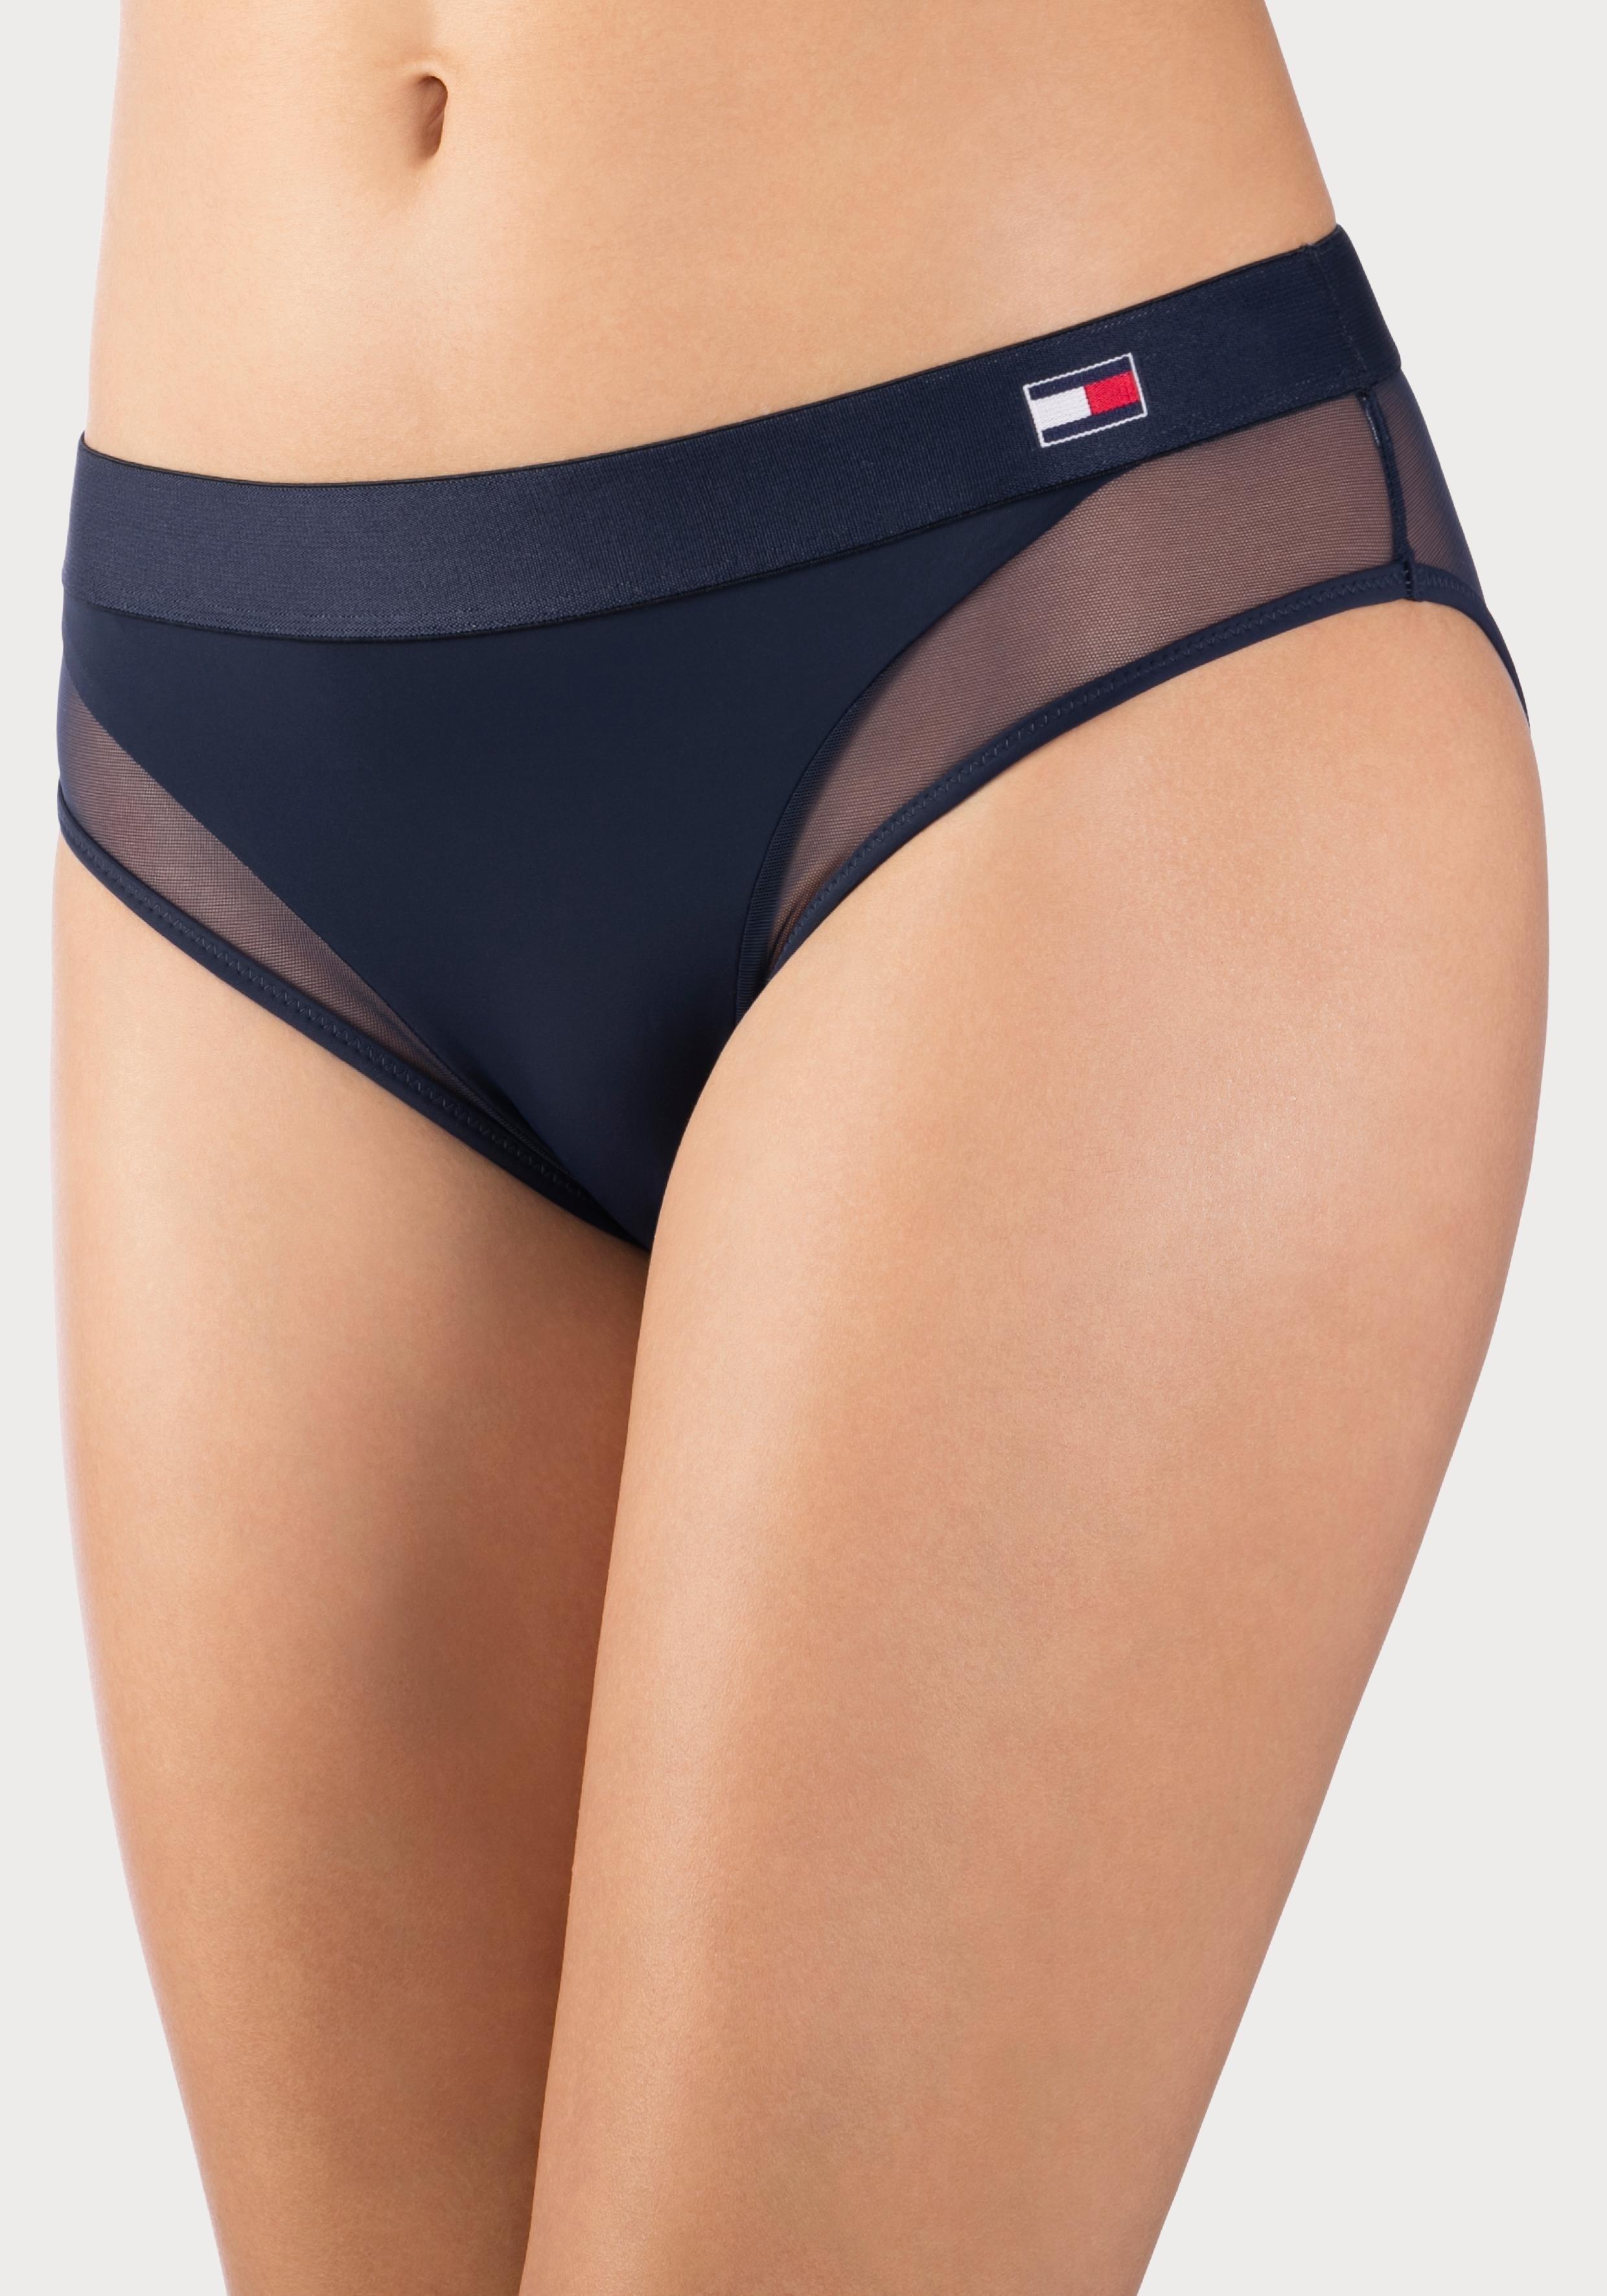 Tommy Hilfiger bikinislip (per stuk) nu online kopen bij Lascana